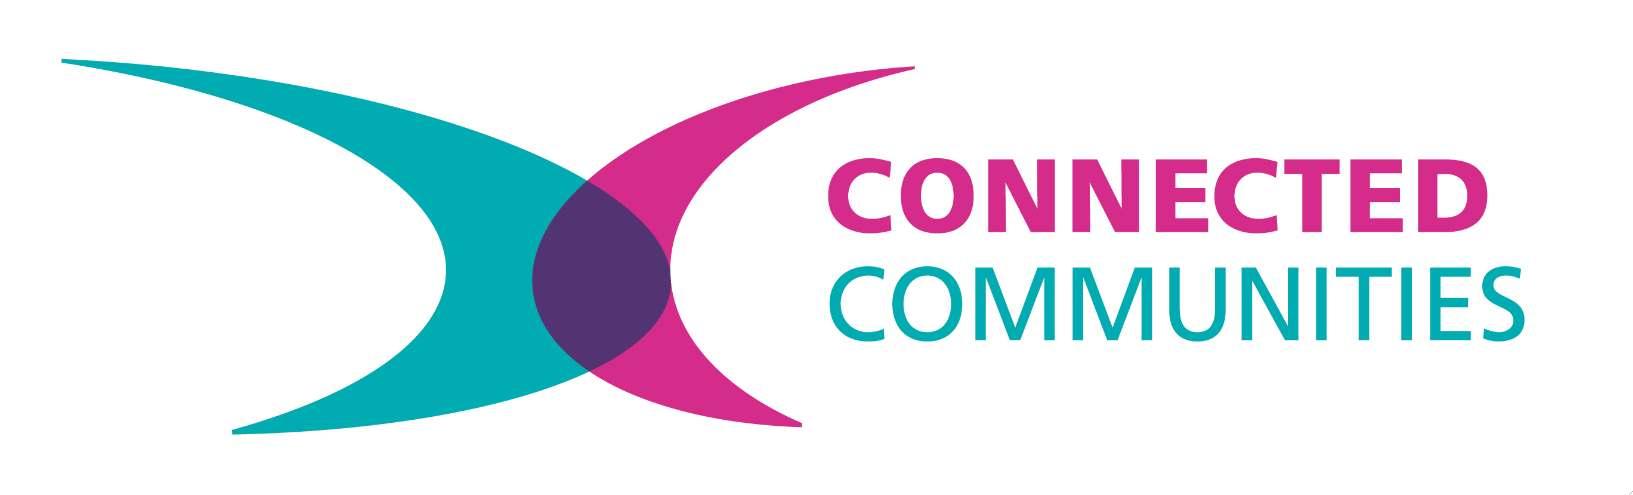 Connected Communities logo.jpg